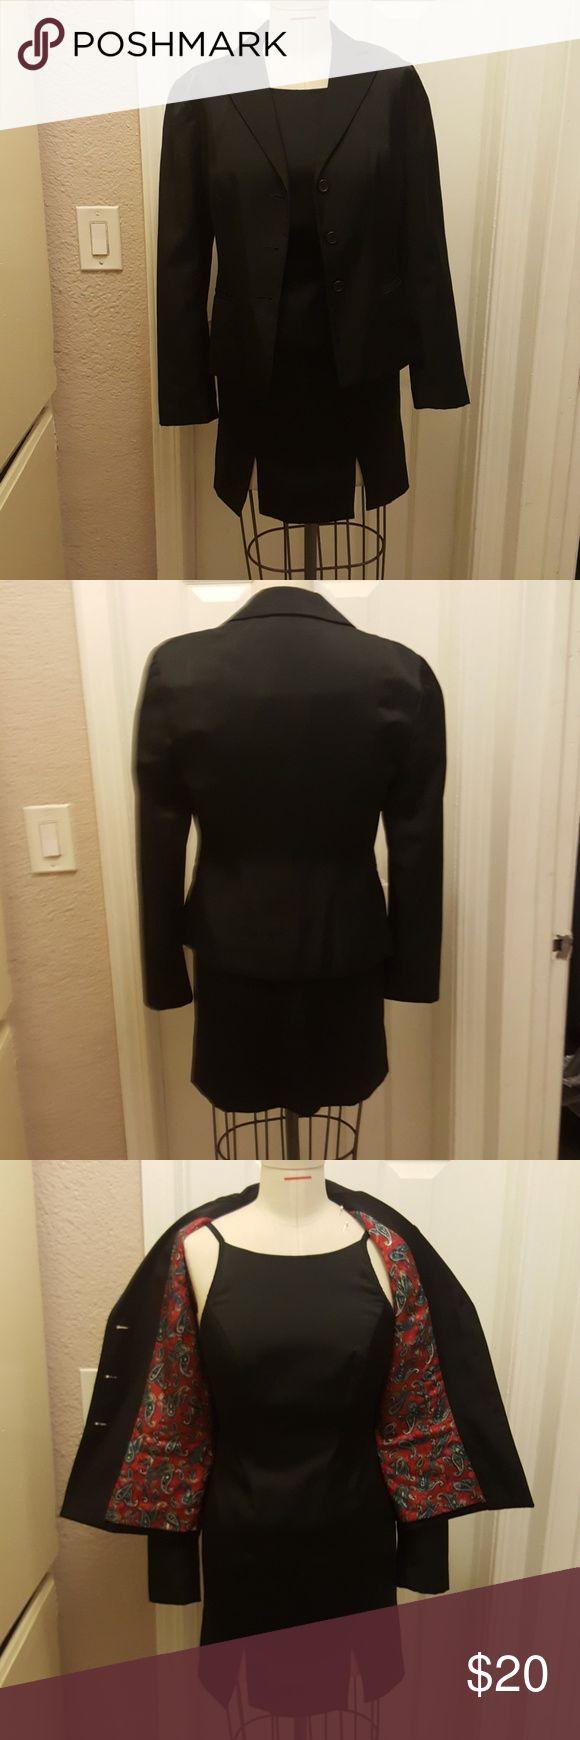 Darda Debonne Like new black dress and black coat with zipper on the back Darda Debonne Dresses Mini